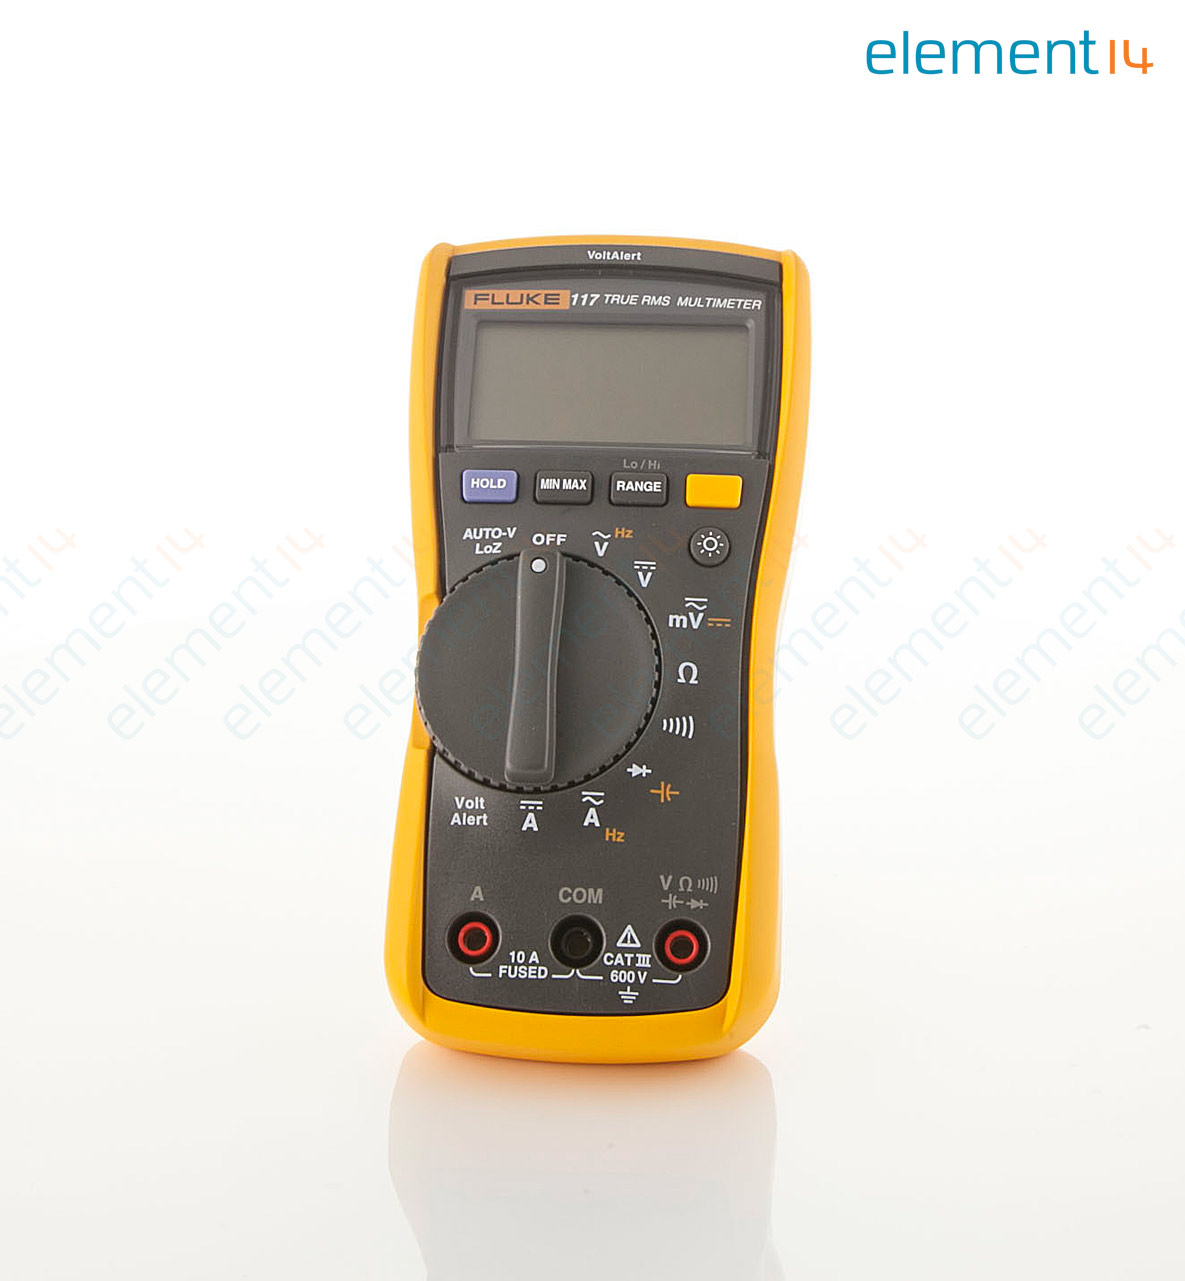 Fluke 117 Electricians Digital Multimeter 110 Series 6000 Count Digitalmultimetercircuitboard14691919jpg